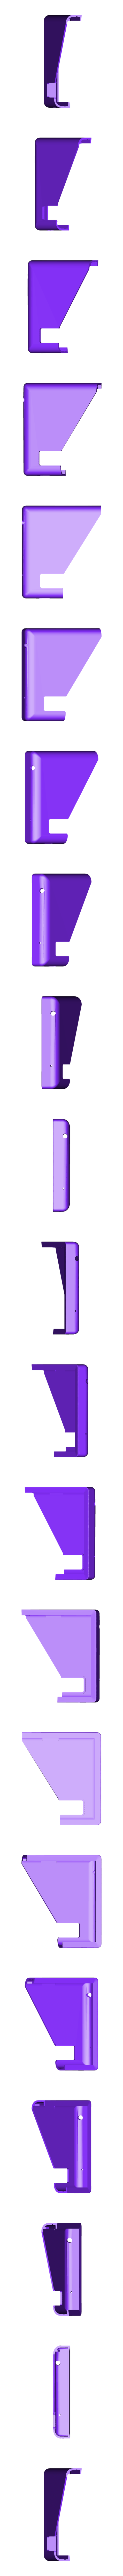 cova103_top.stl Download free STL file Fairphone 2 cover • 3D printer model, unwohlpol